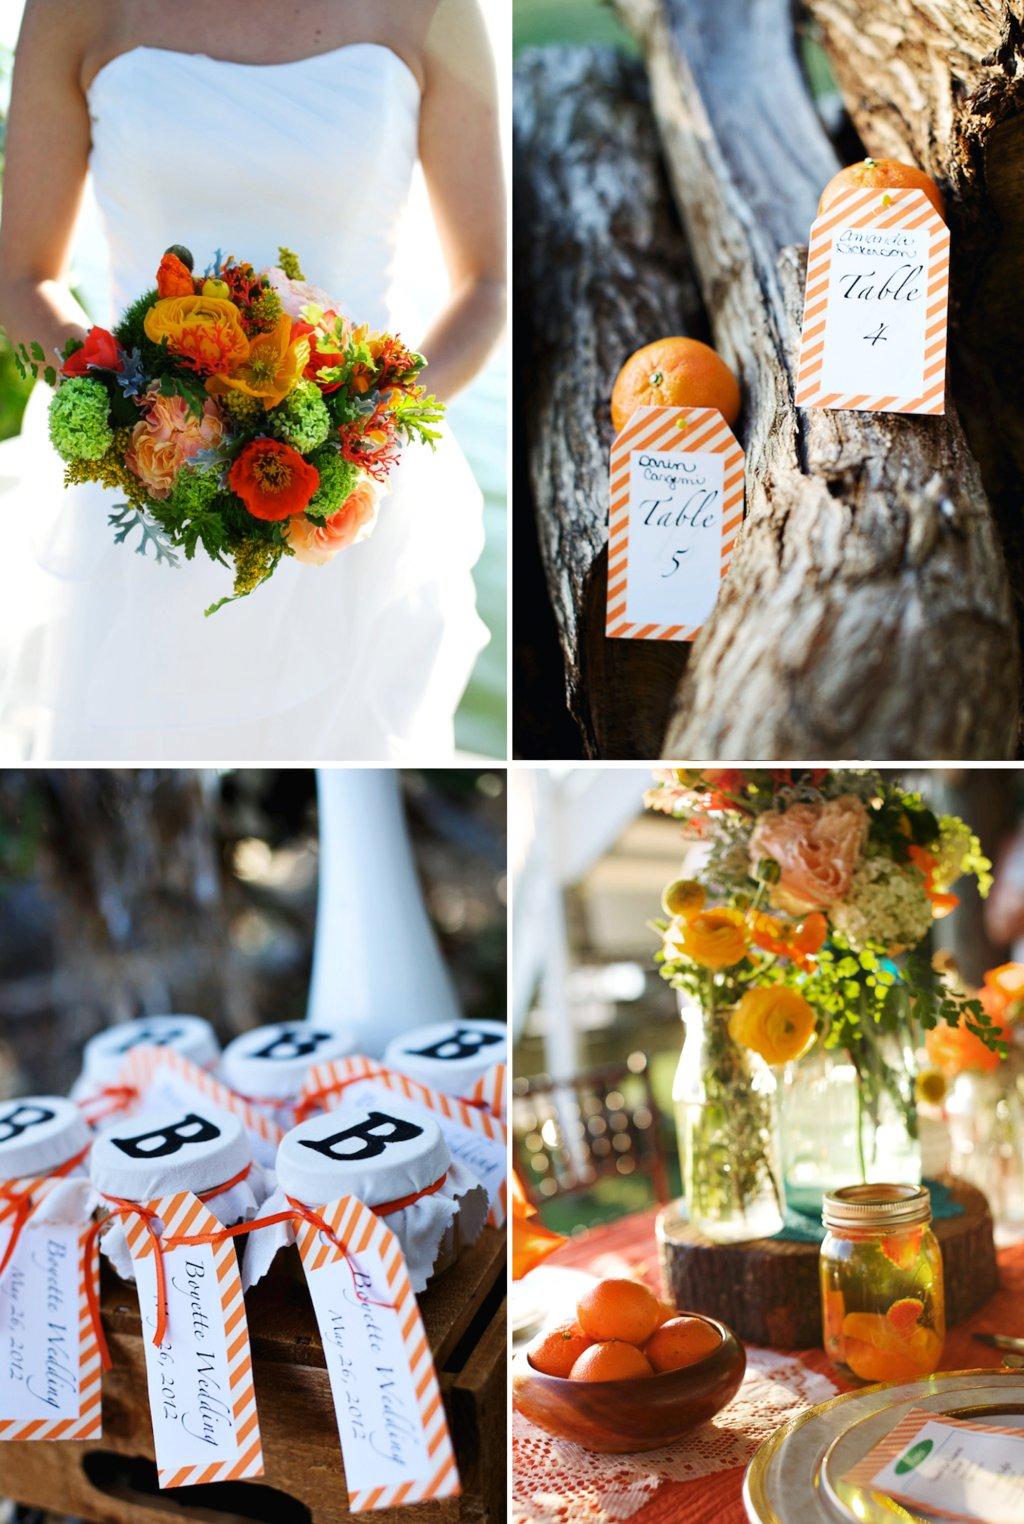 Rustic-citrus-wedding-inspiration-mason-jar-centerpieces-escort-cards.full